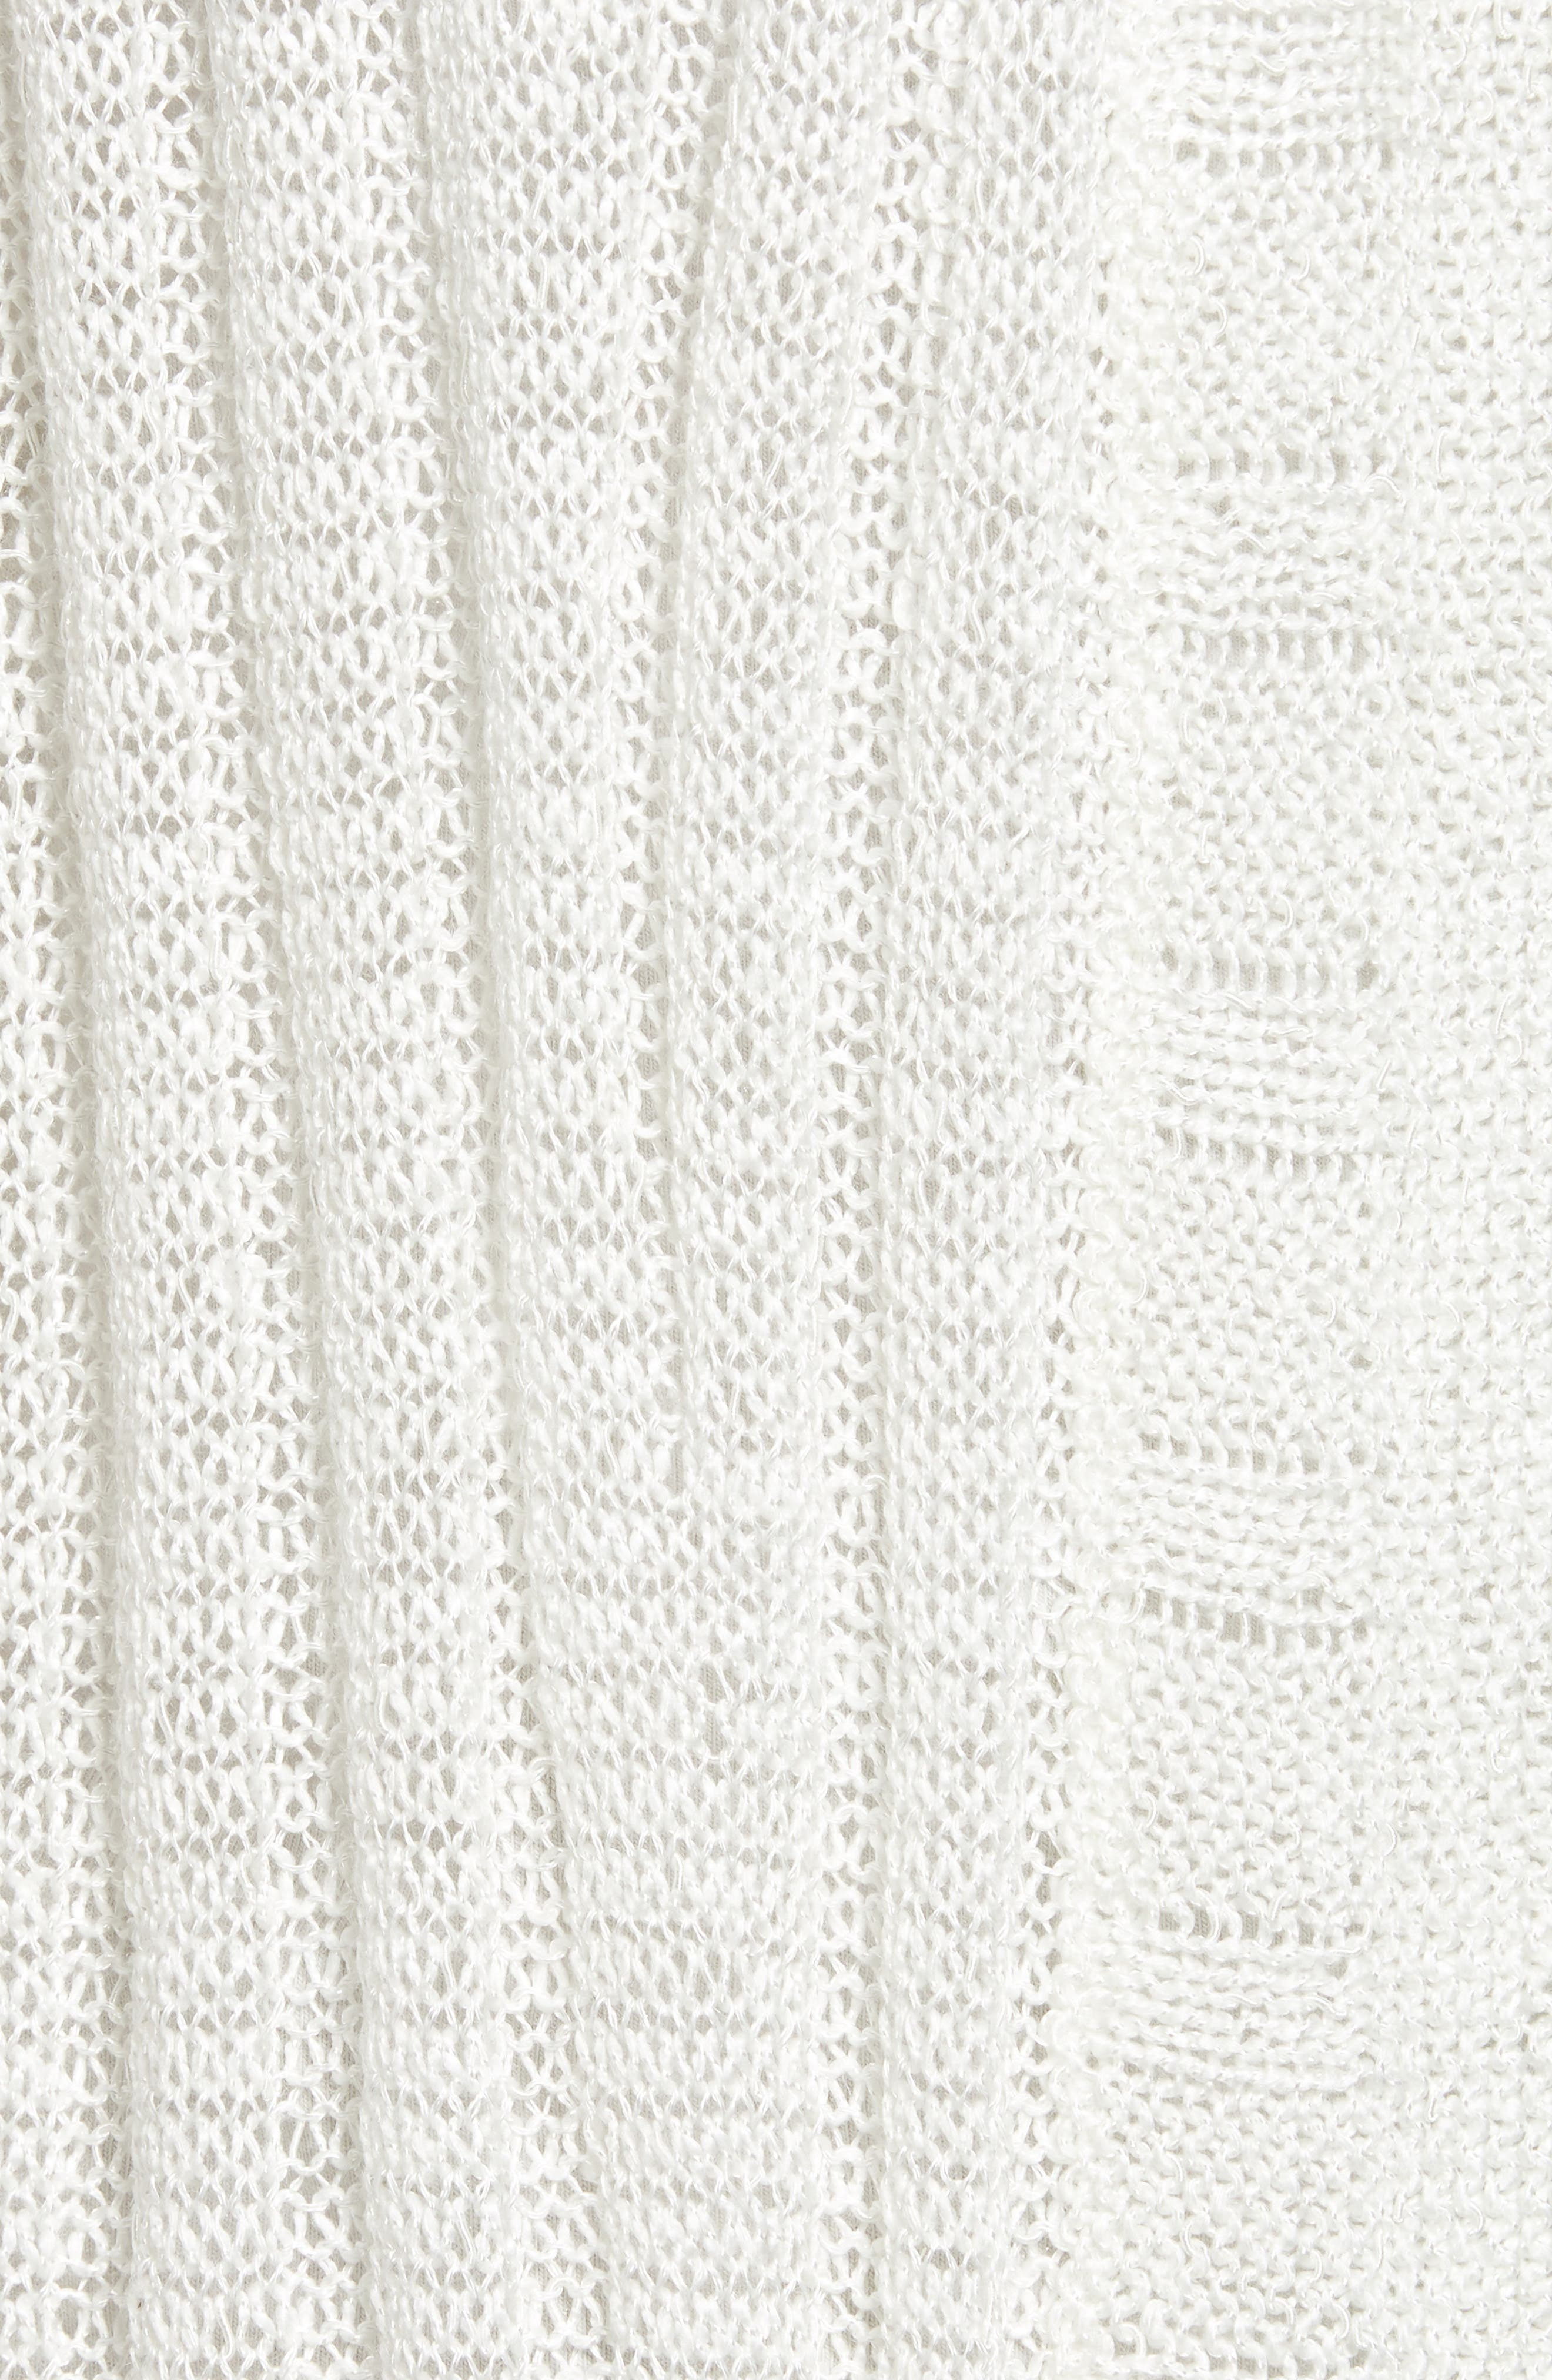 Changing Tides Linen Blend Open Front Cardigan,                             Alternate thumbnail 6, color,                             Milk White